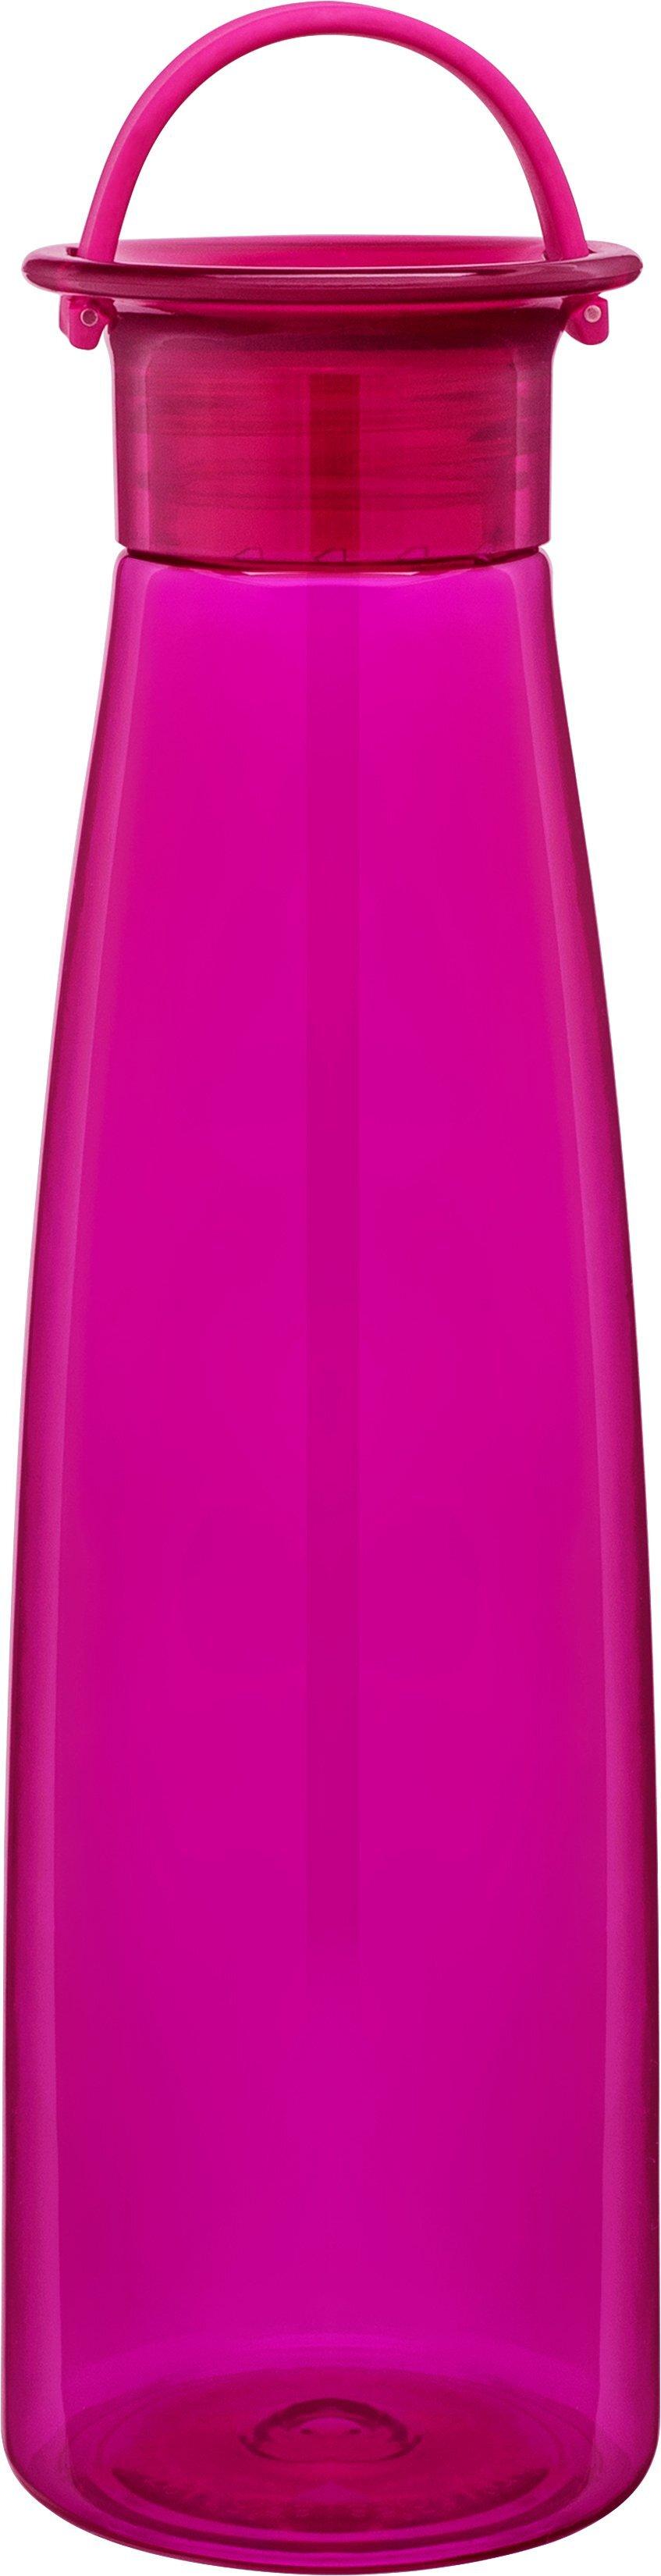 h2go Sway Sport Bottle, 25oz.